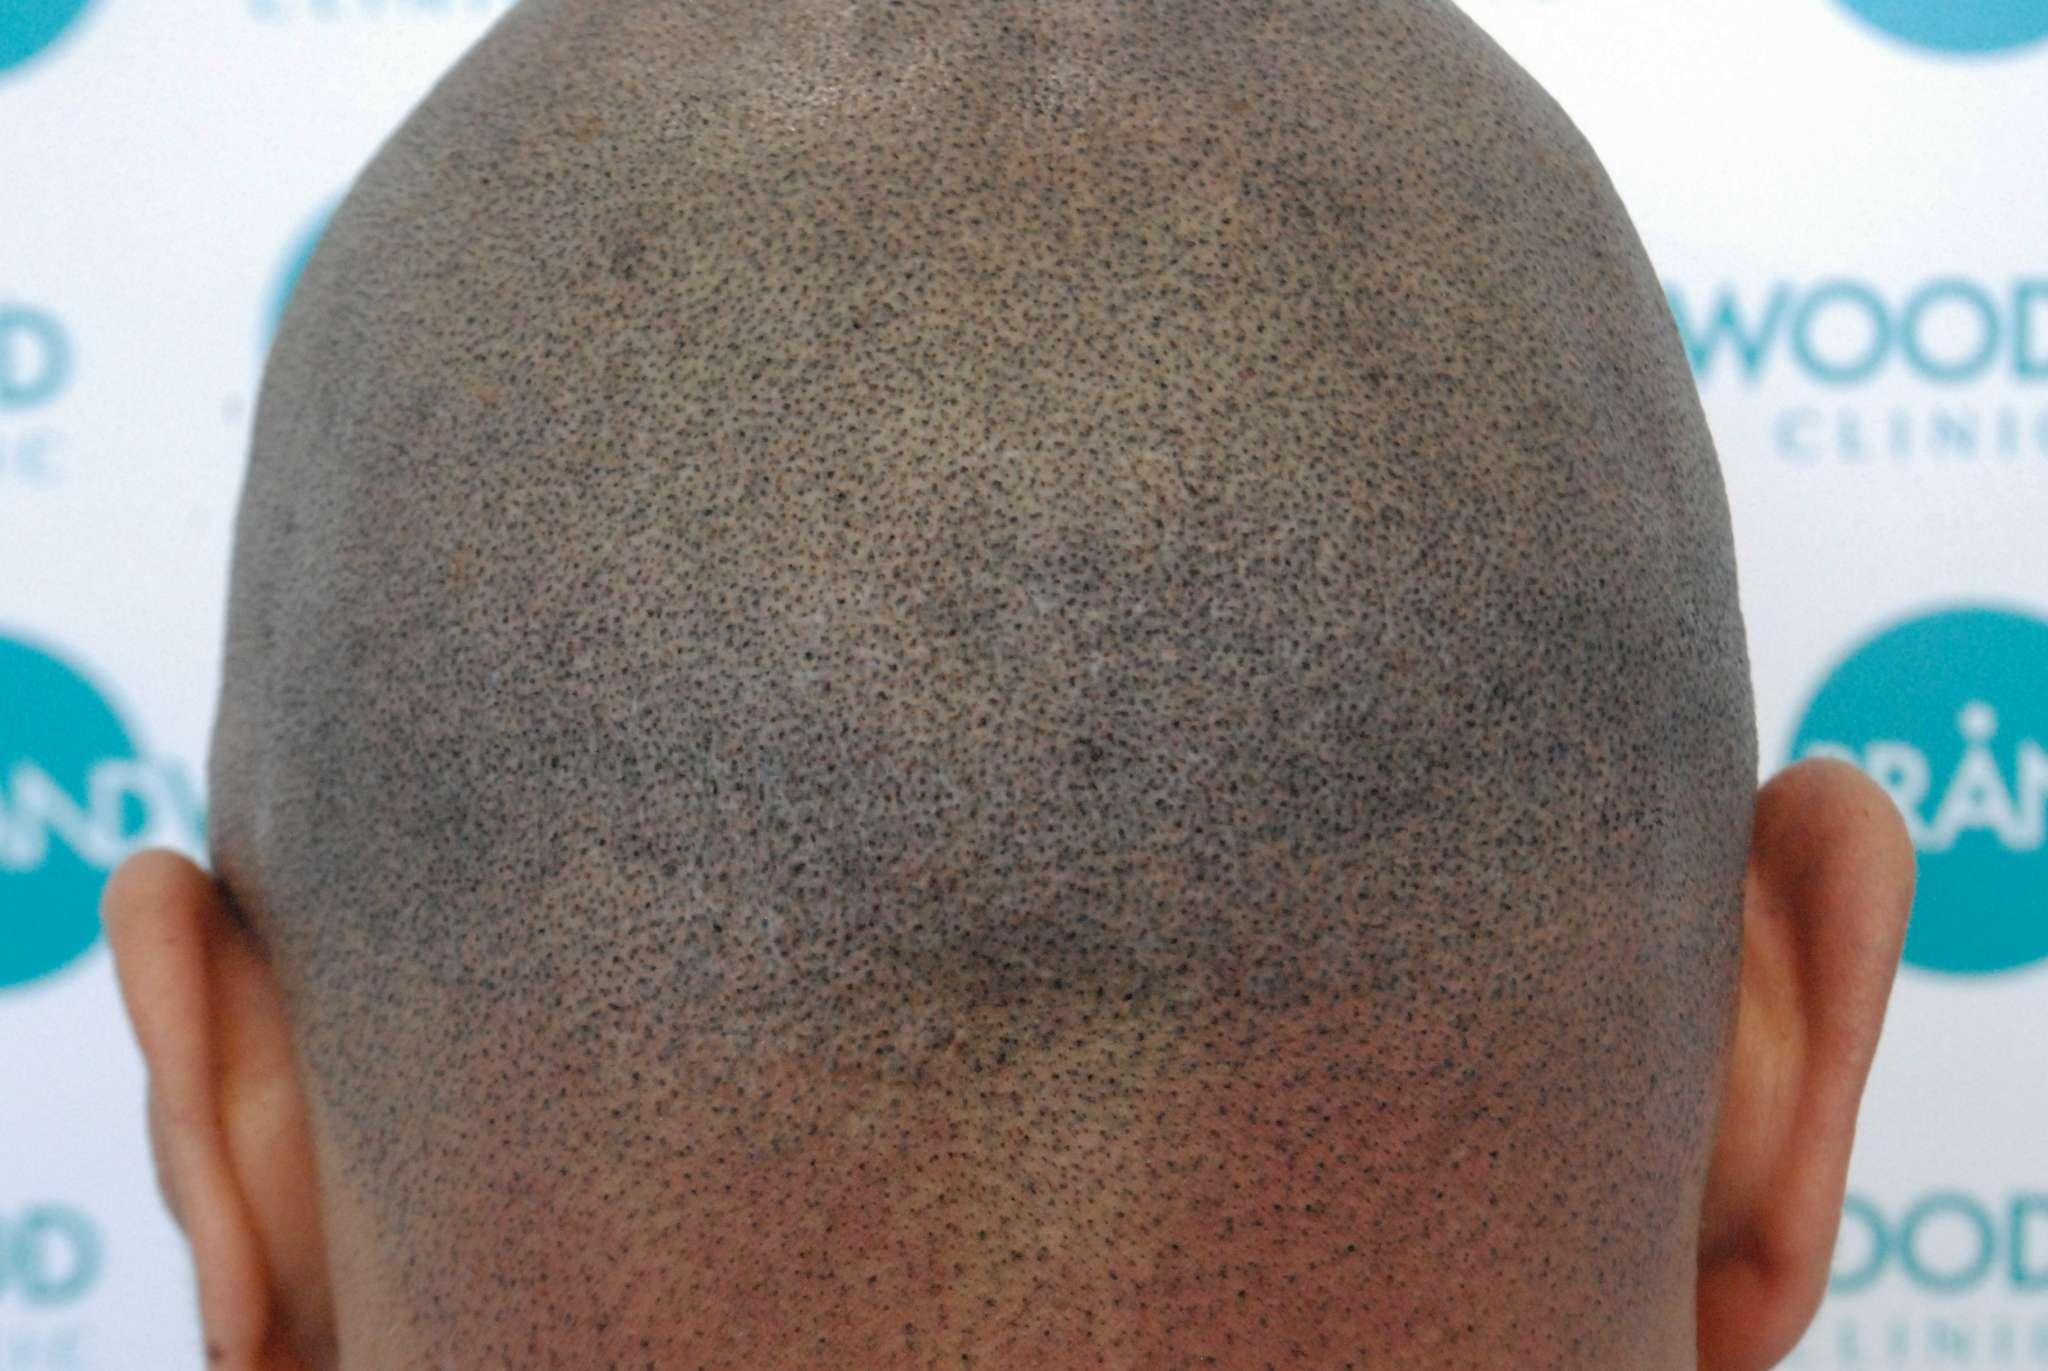 Scar coverage using Alivio Pigment on Light Asian skin tone